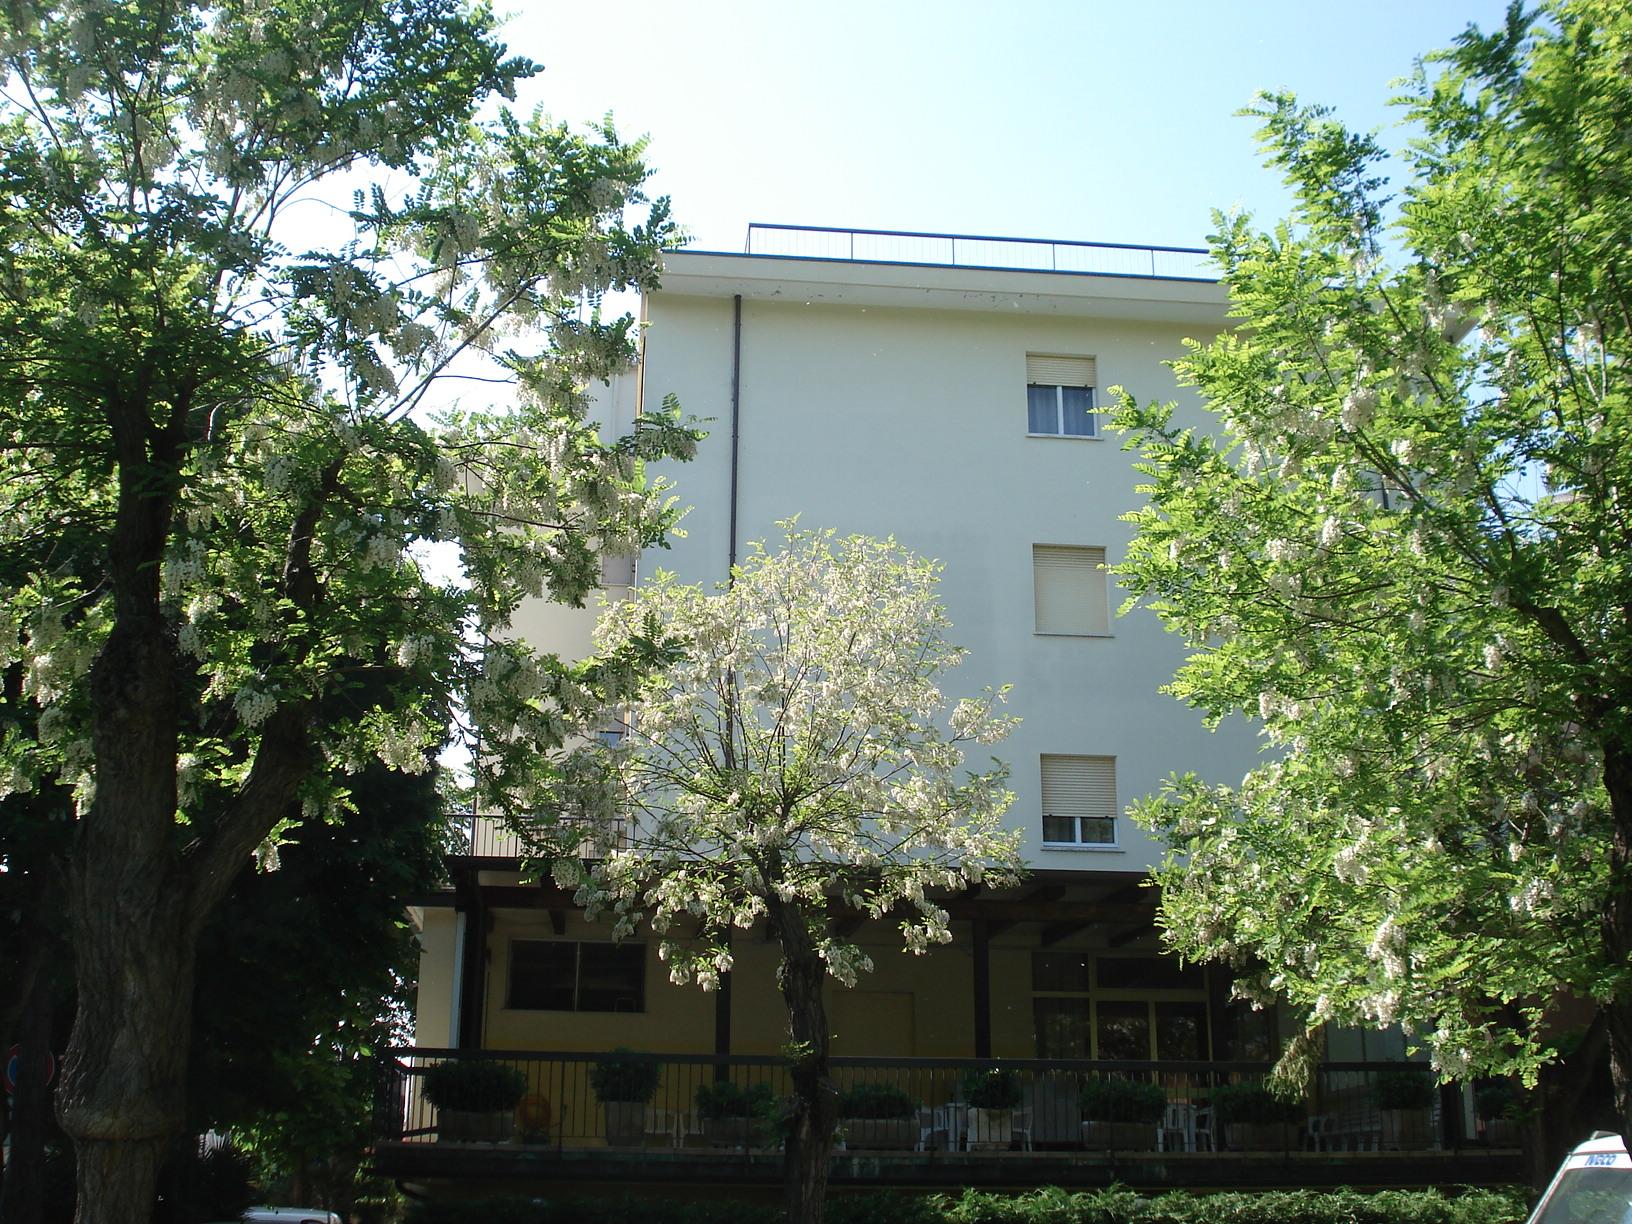 Albergo Serafini